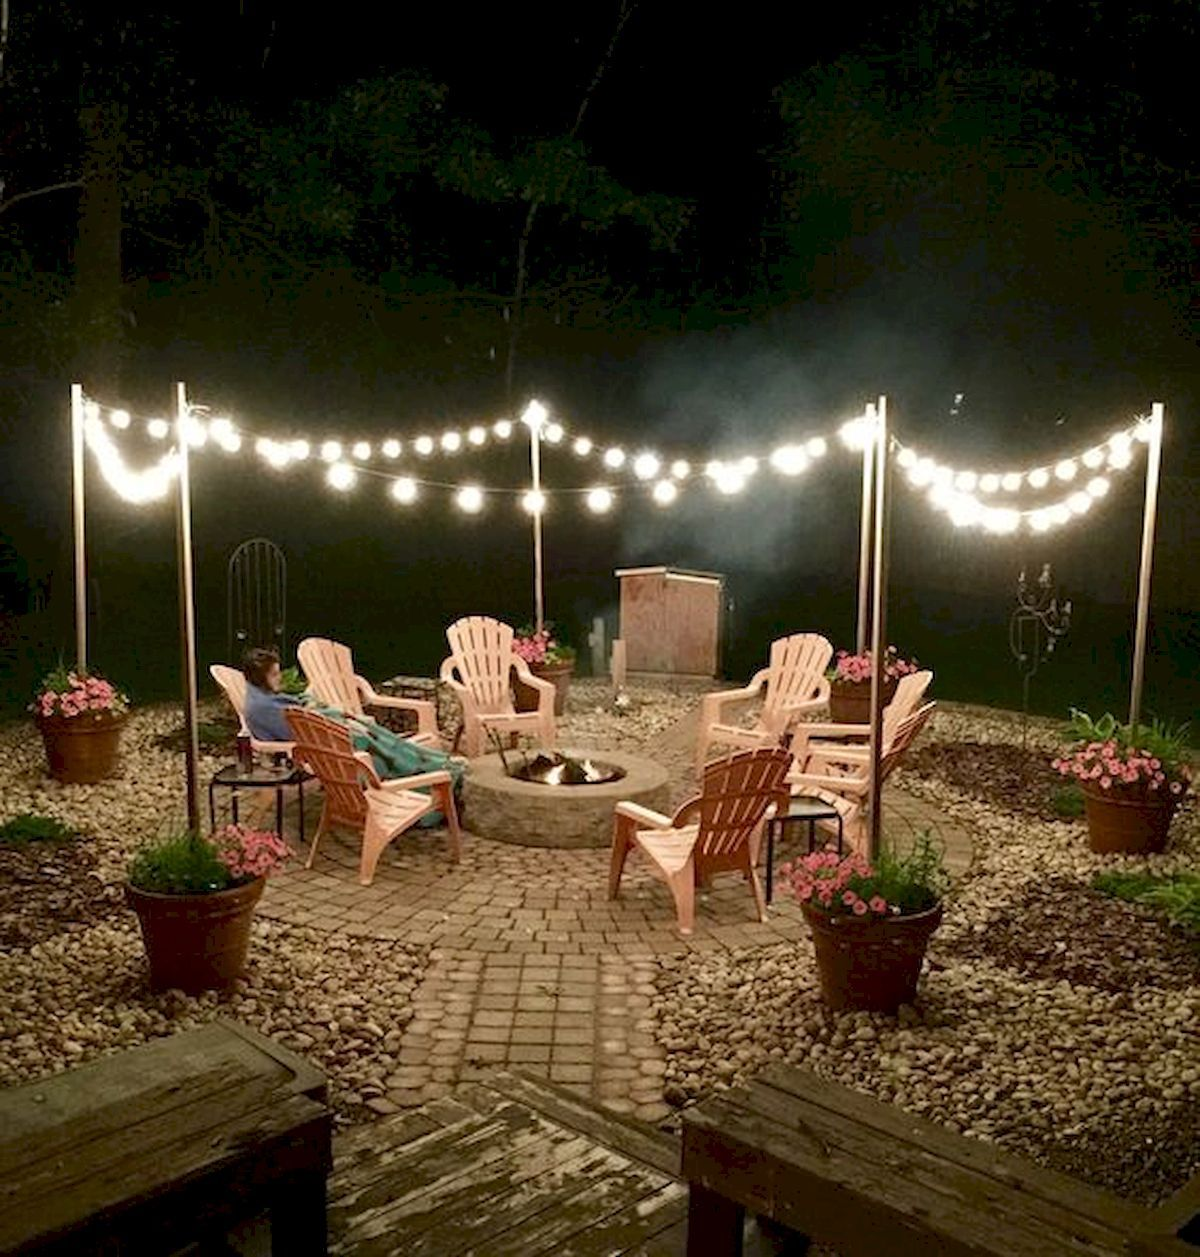 60 Creative Backyard Fire Pit Ideas #backyardideas